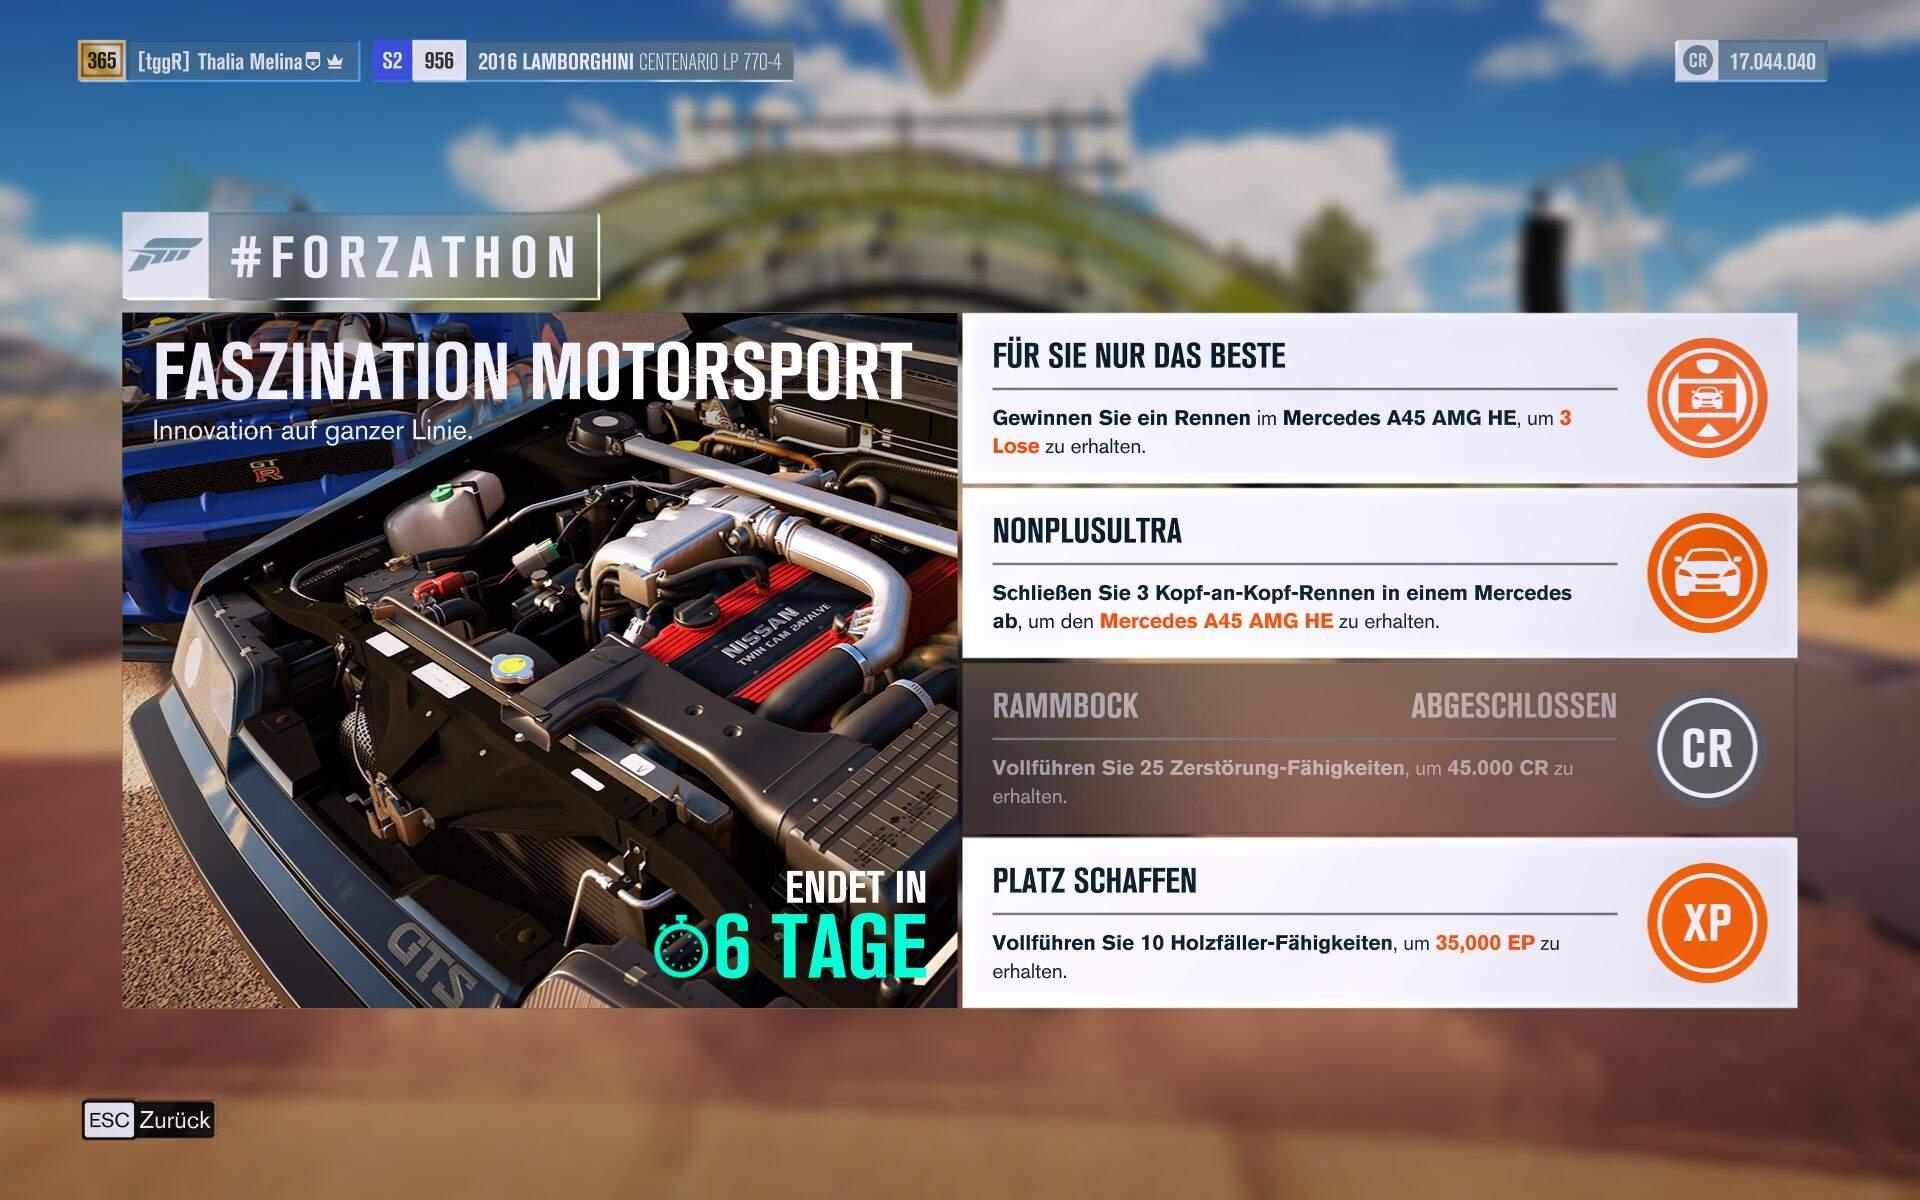 Forza Horizon 3 #Forzathon Guide KW 42 – Faszination Motorsport